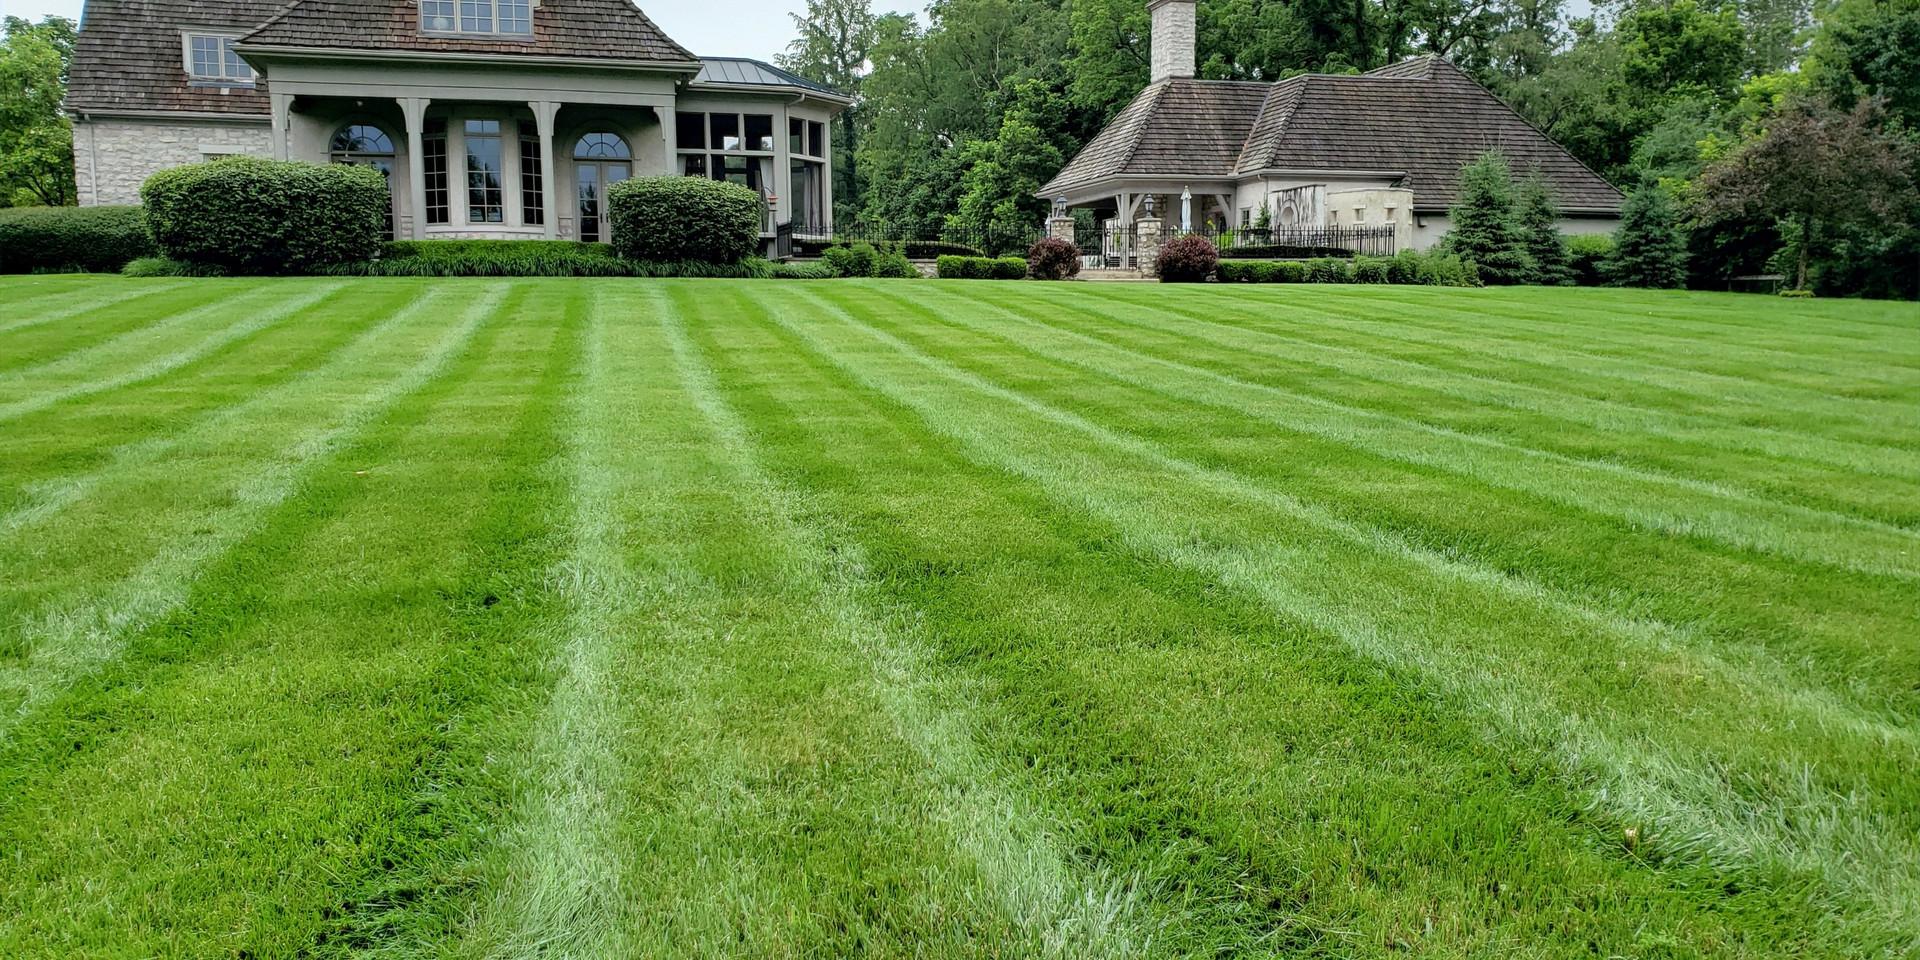 Weekly and Biweekly Cuts and Maintenance